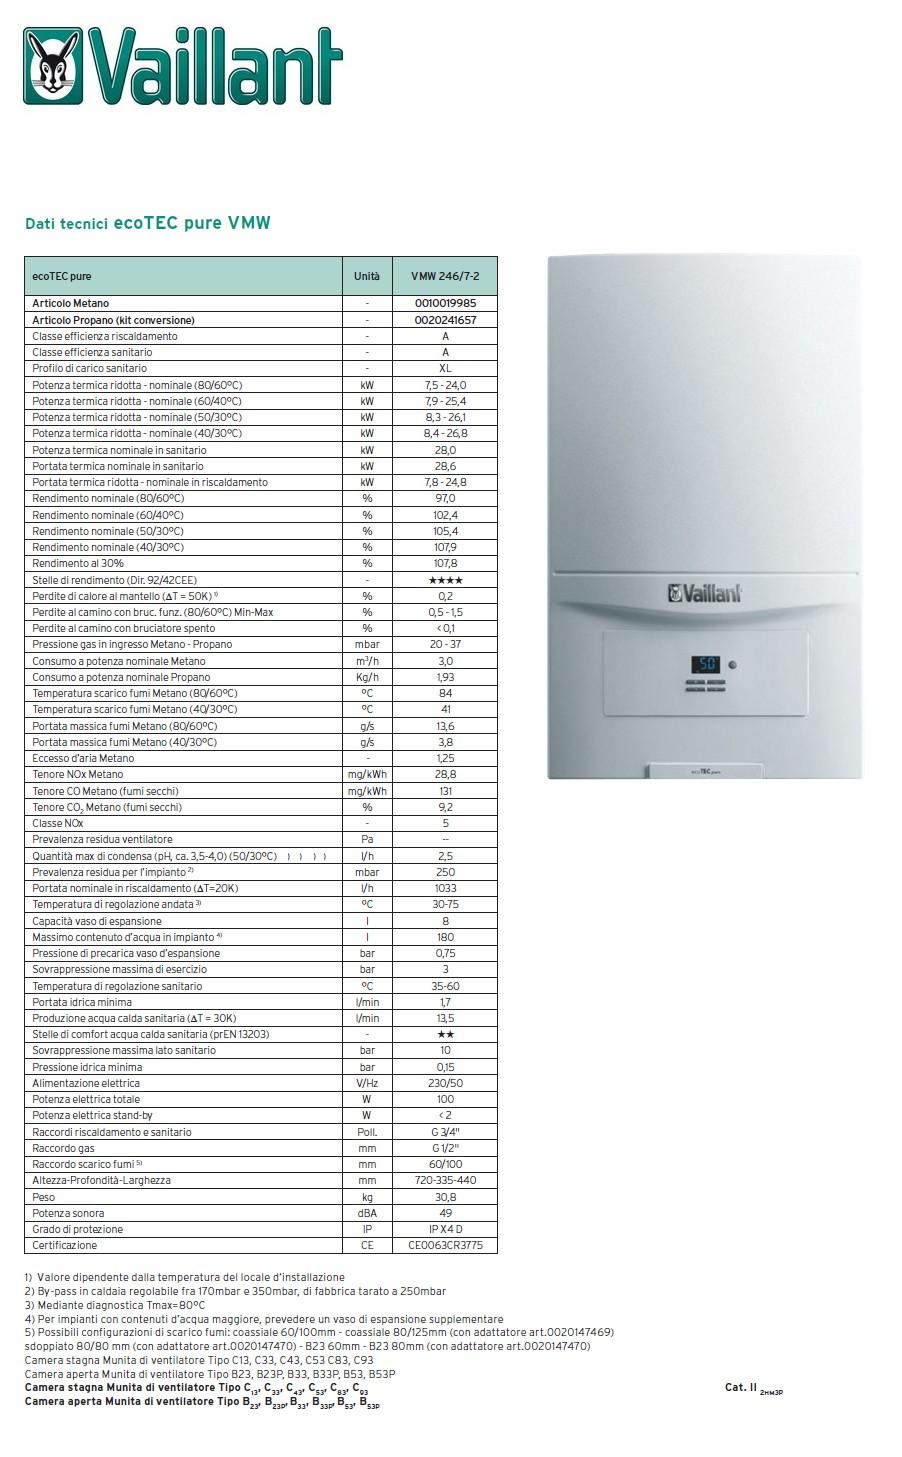 Caldaia Vaillant Ecotec Pure A Condensazione Vmw 246 7 2 Camera